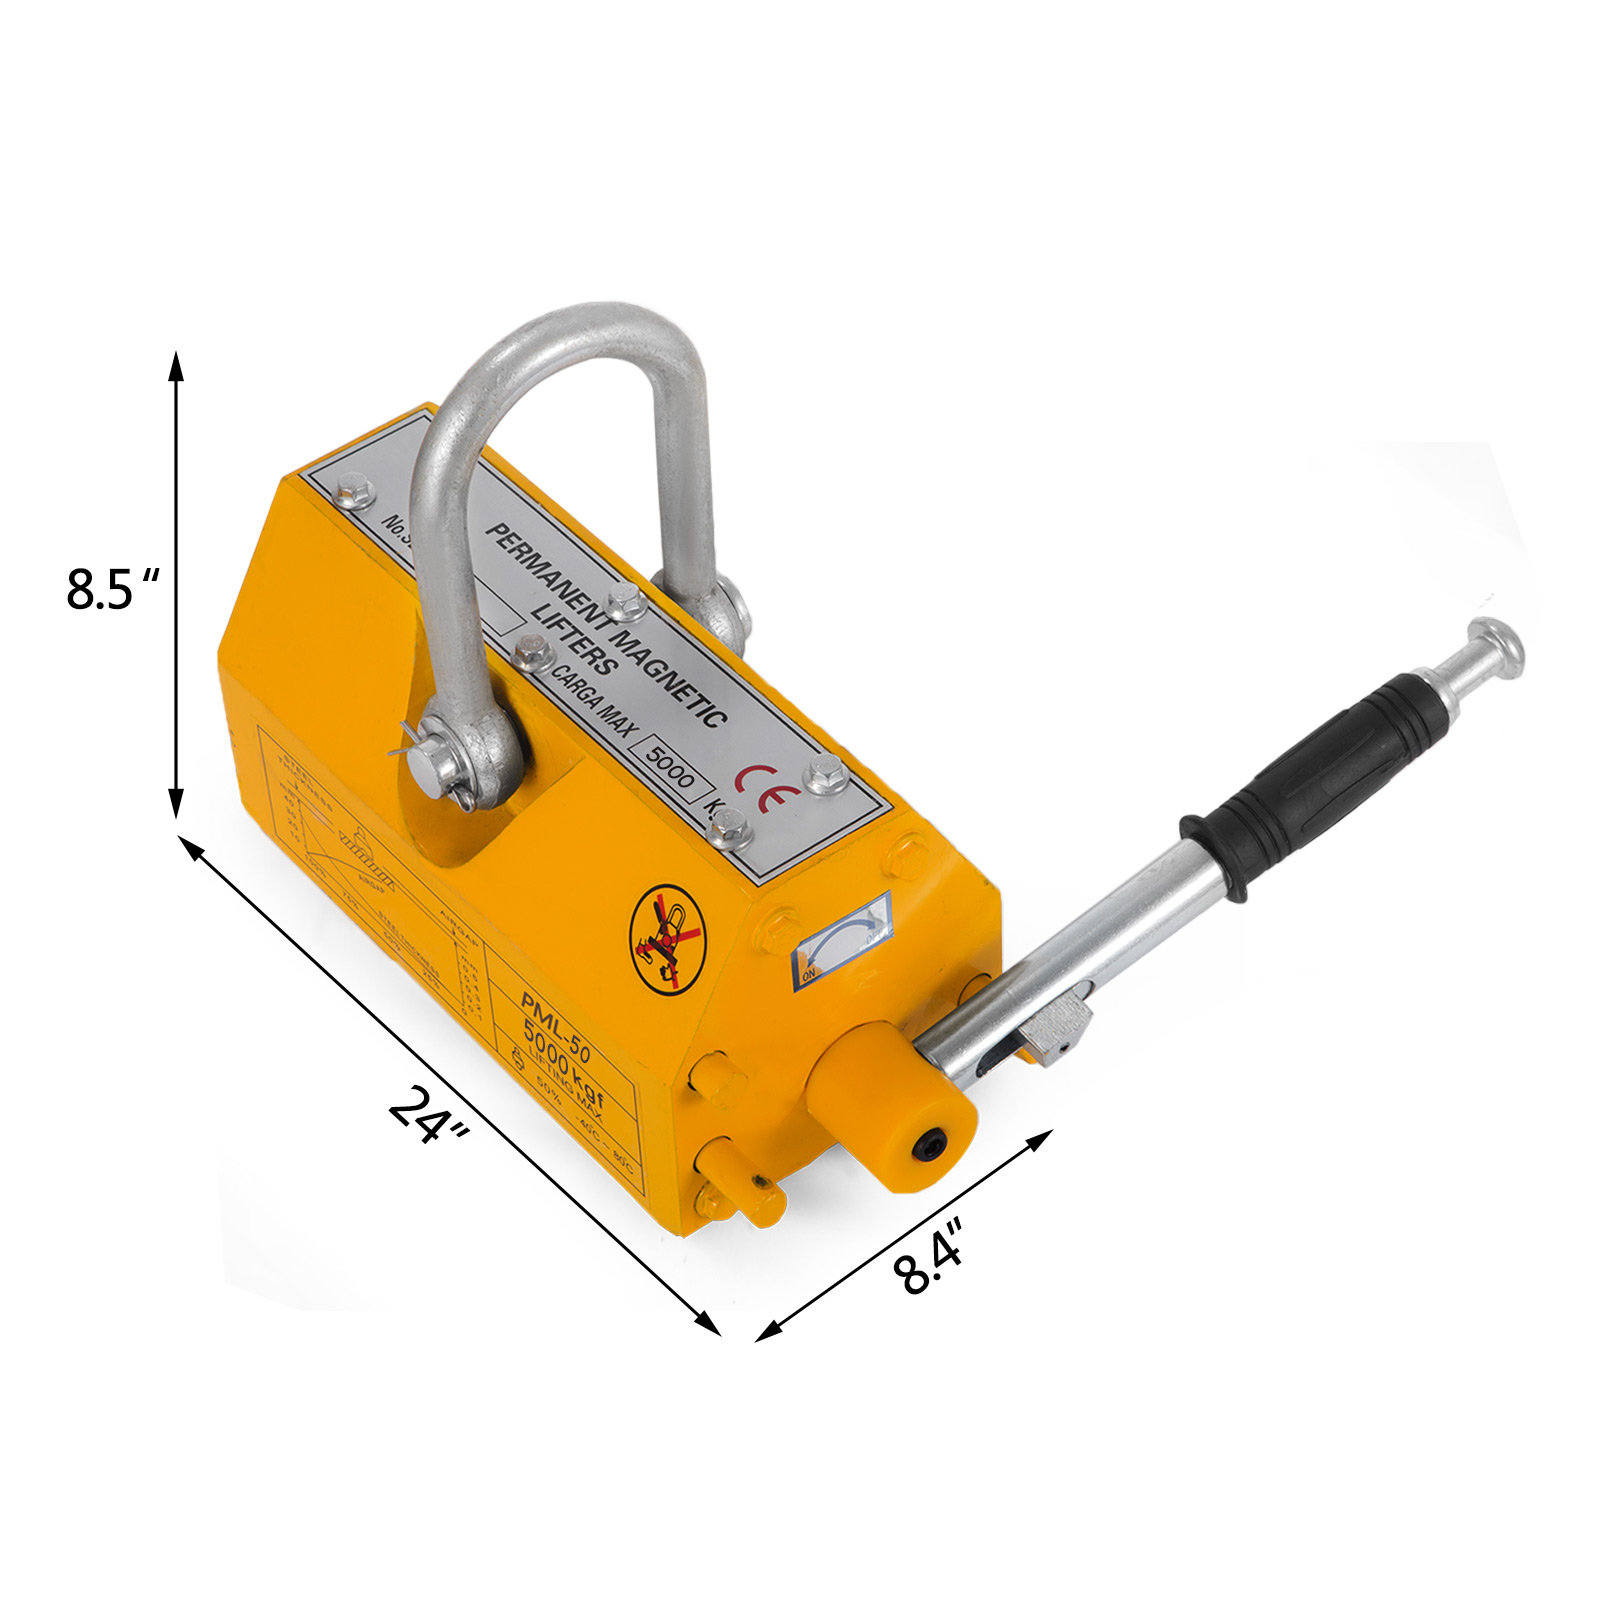 100-300-600-1000KG-Steel-Magnetic-Lifter-Heavy-Duty-Crane-Hoist-Lifting-Magnet miniature 110